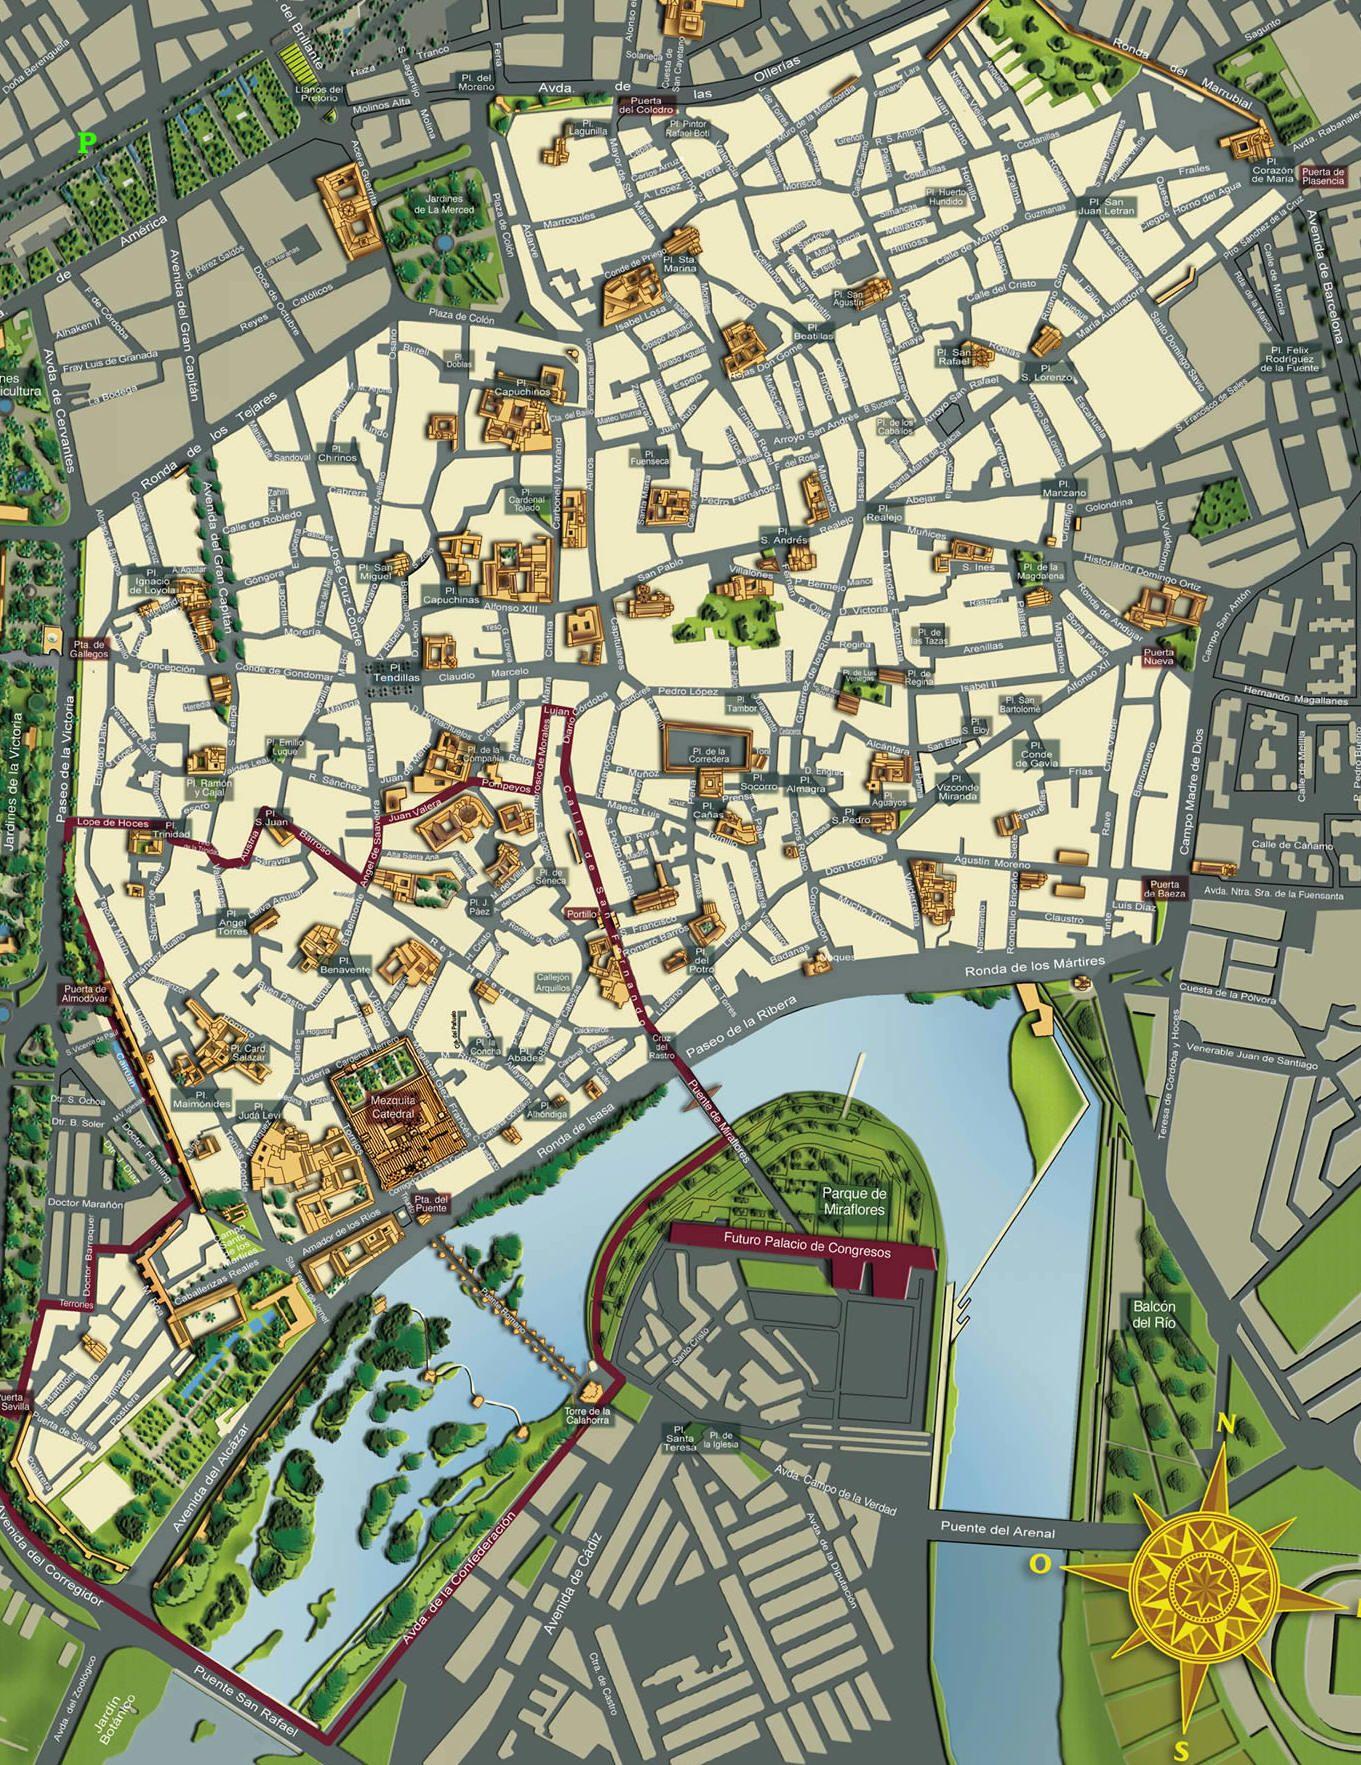 Cartina Mappa Spagna.Mappa Cordova Cartina Di Cordova In Spagna Cordoba Spagna Cordoba Mappe Illustrate